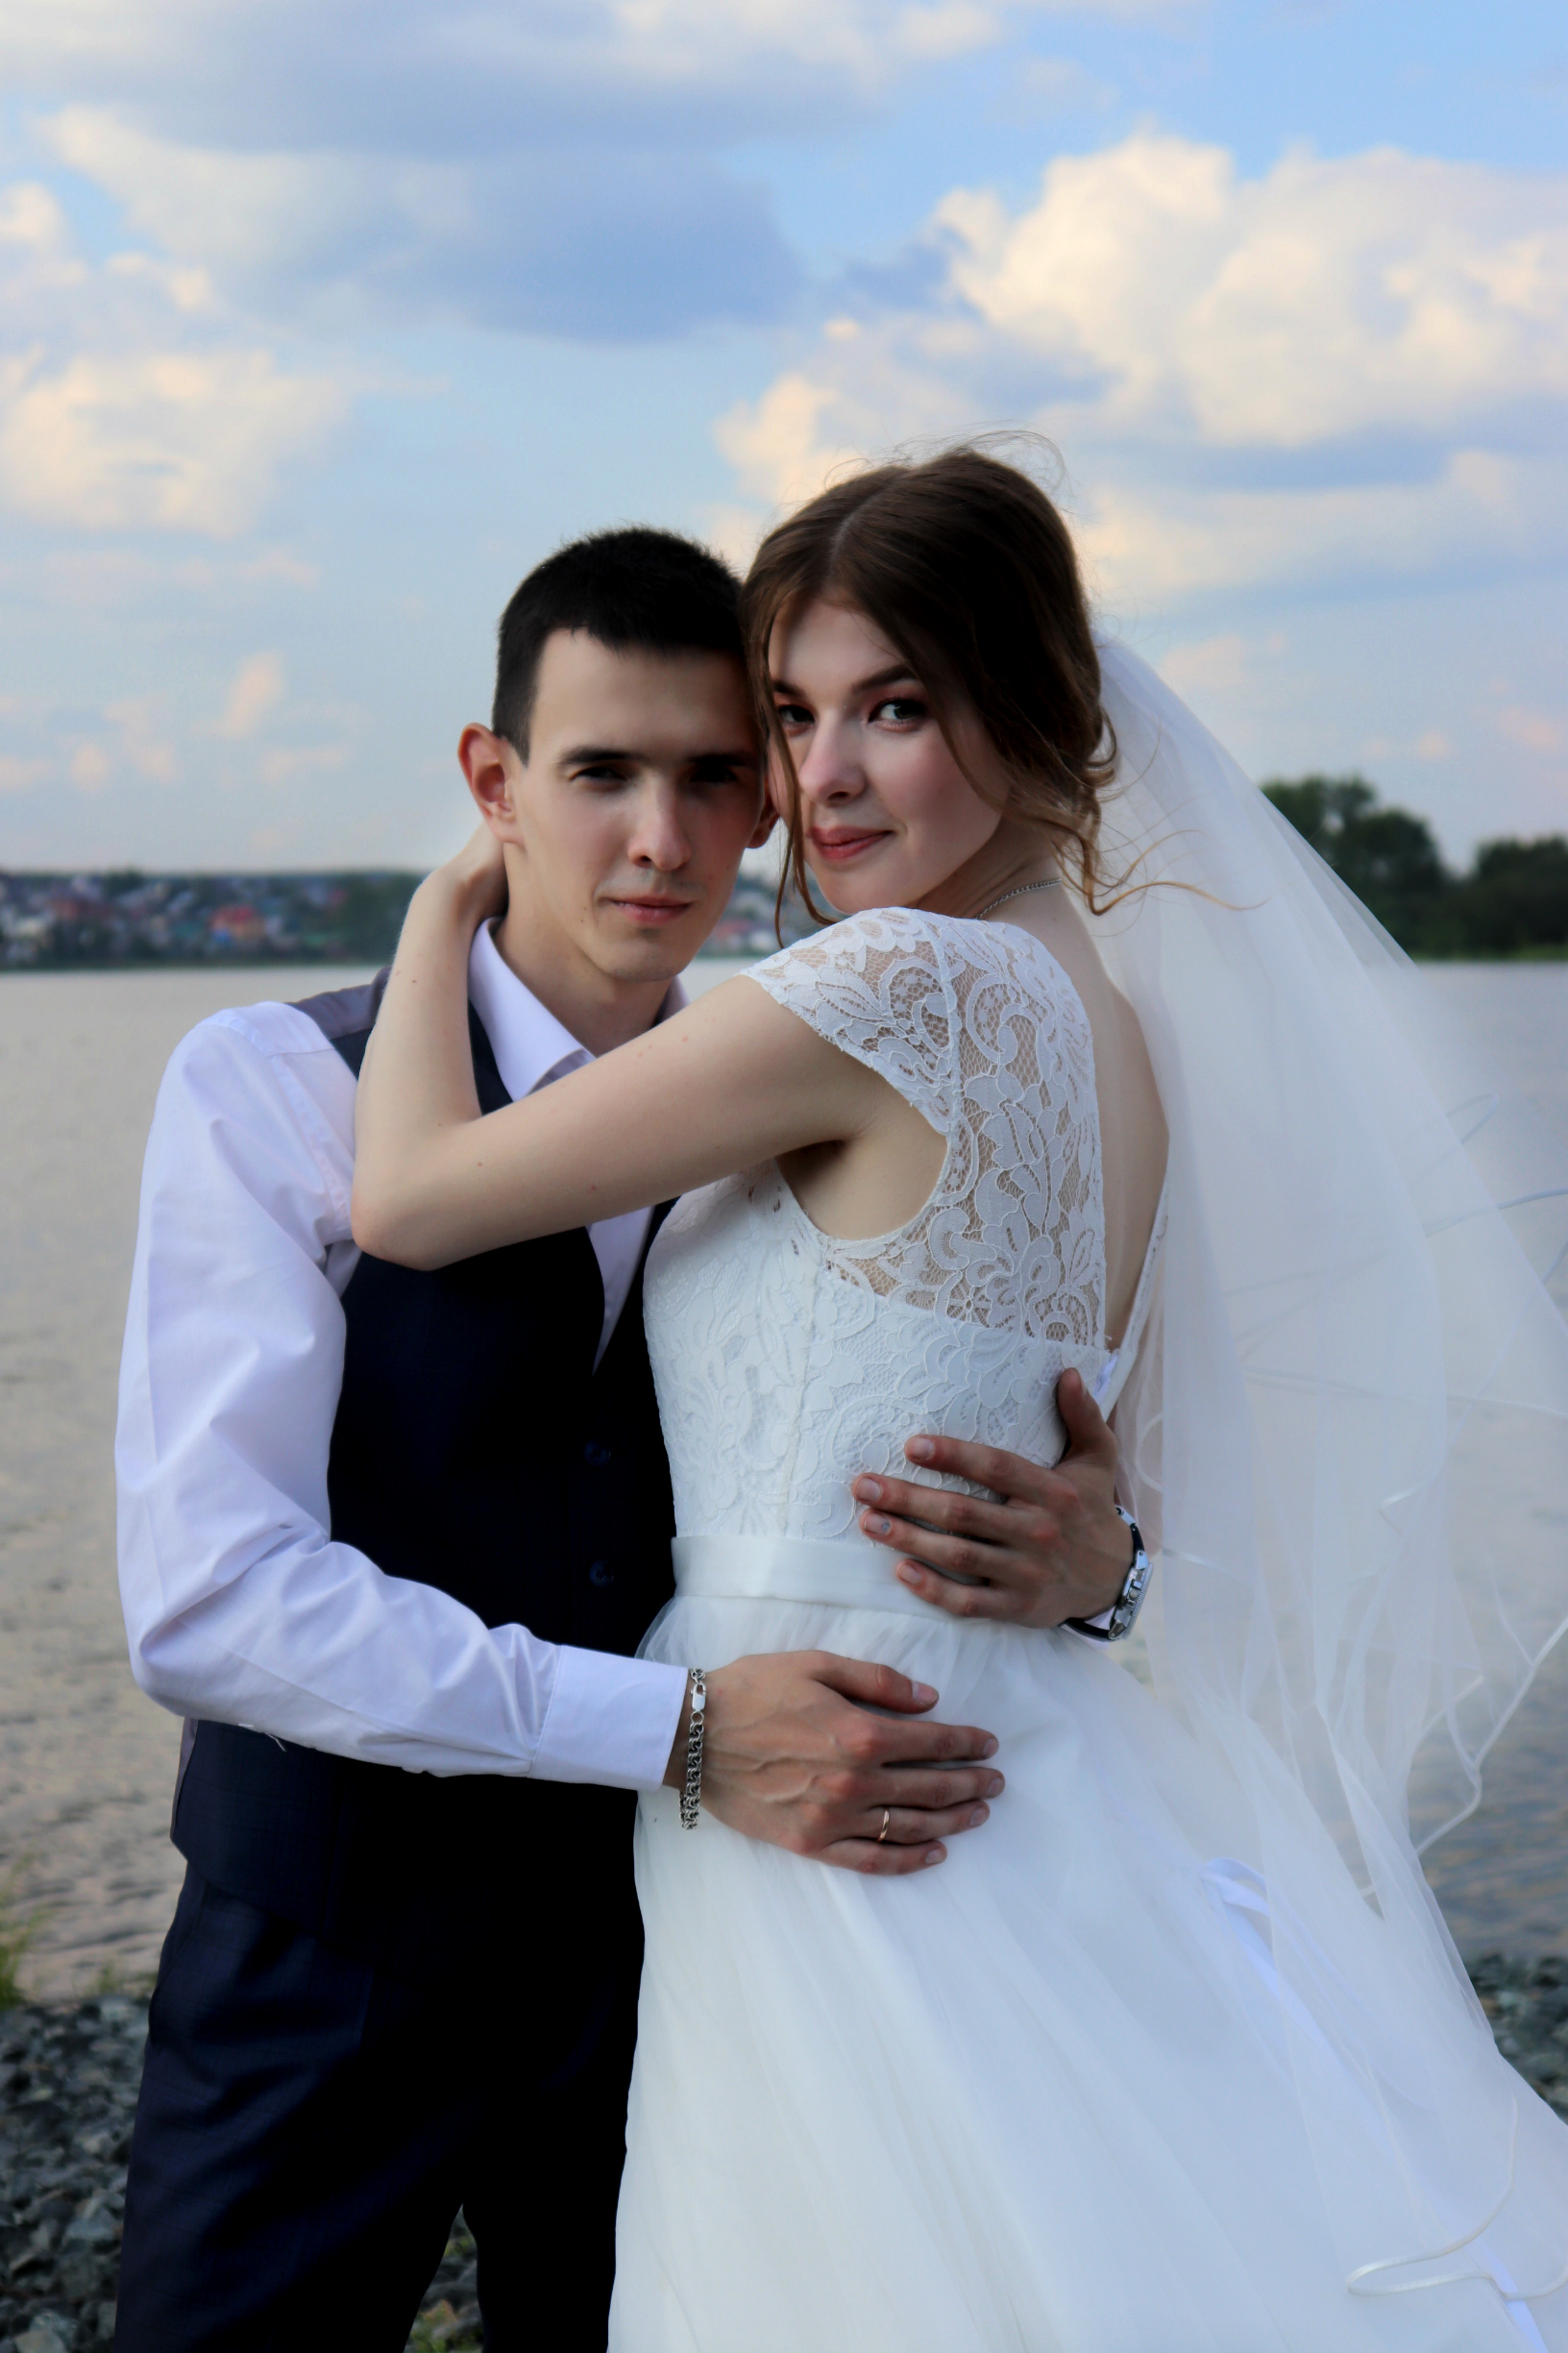 Екатерина Сурягина в Екатеринбурге